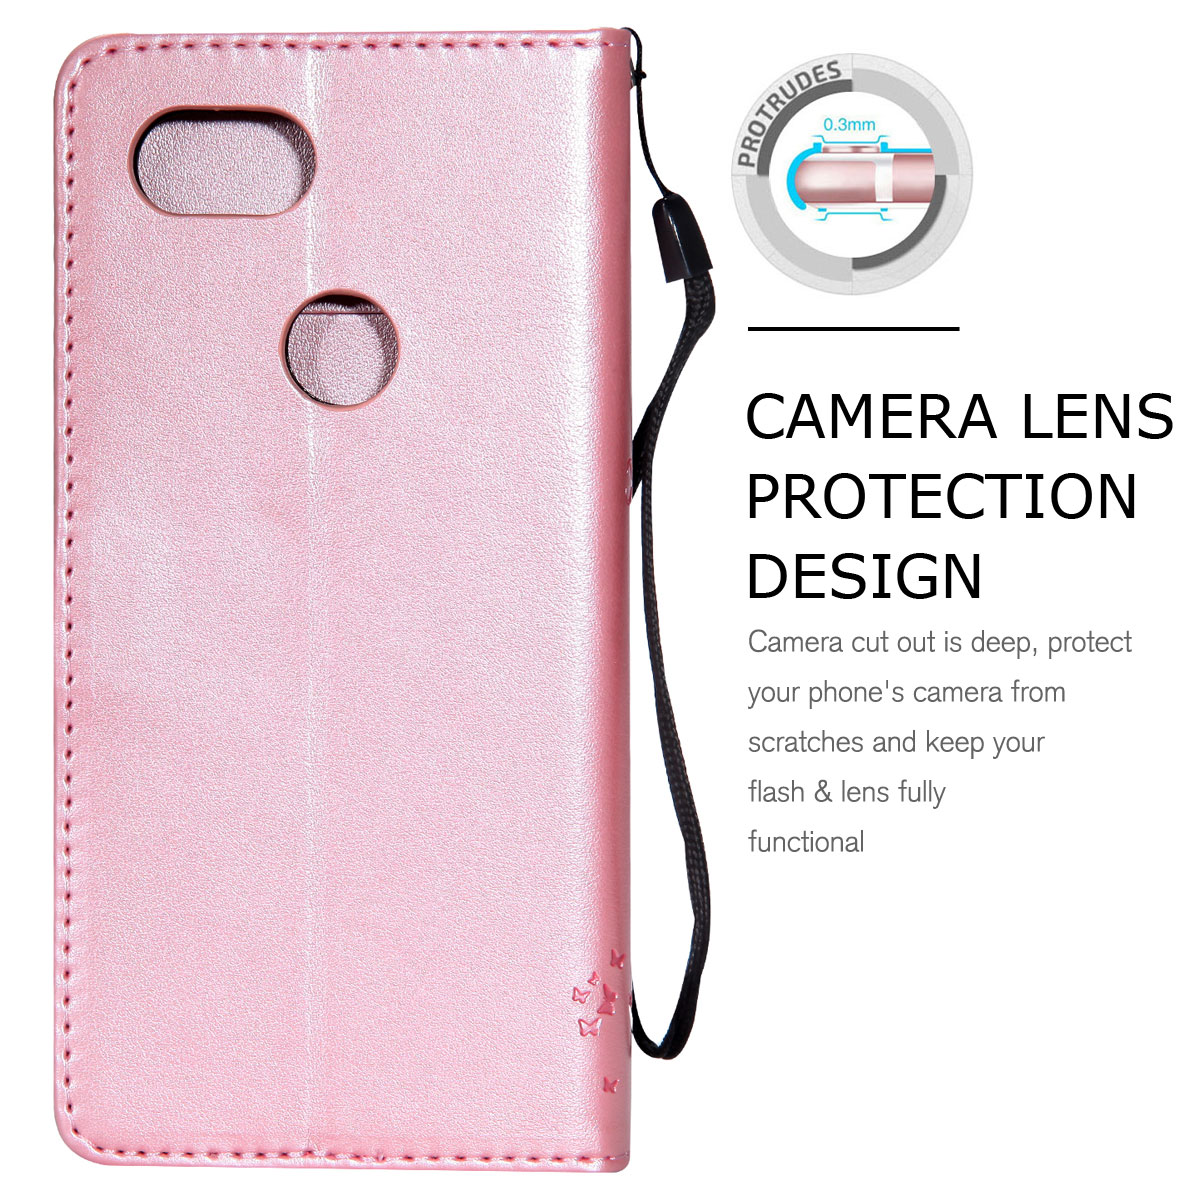 Magnetic-Leather-Credit-Card-Holder-Flip-Case-Cover-For-Google-Pixel-2-2-XL thumbnail 91